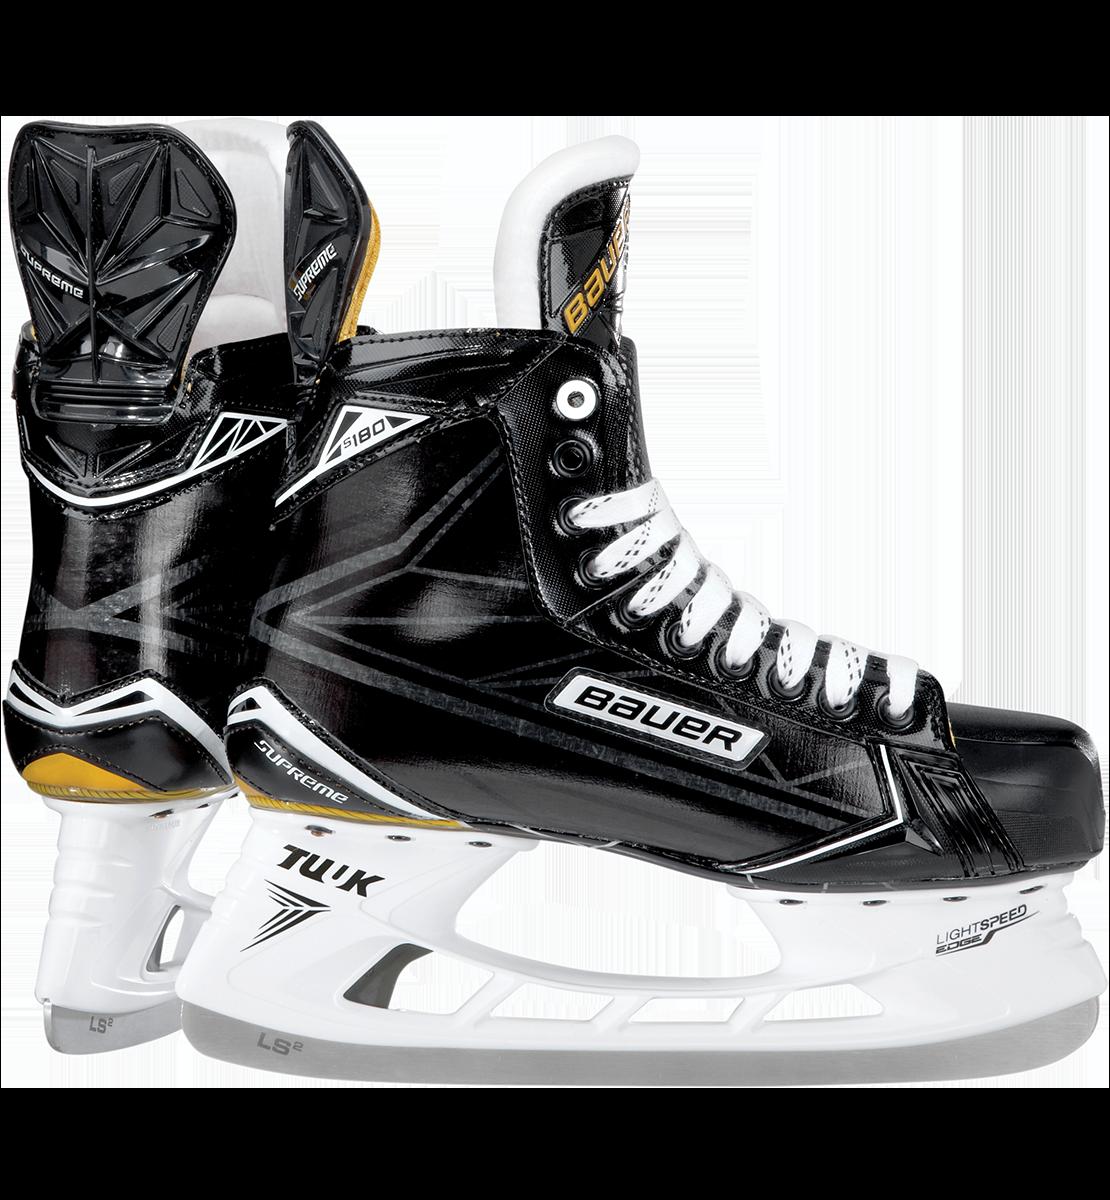 Supreme 180 Skate - Hockey Skates PNG